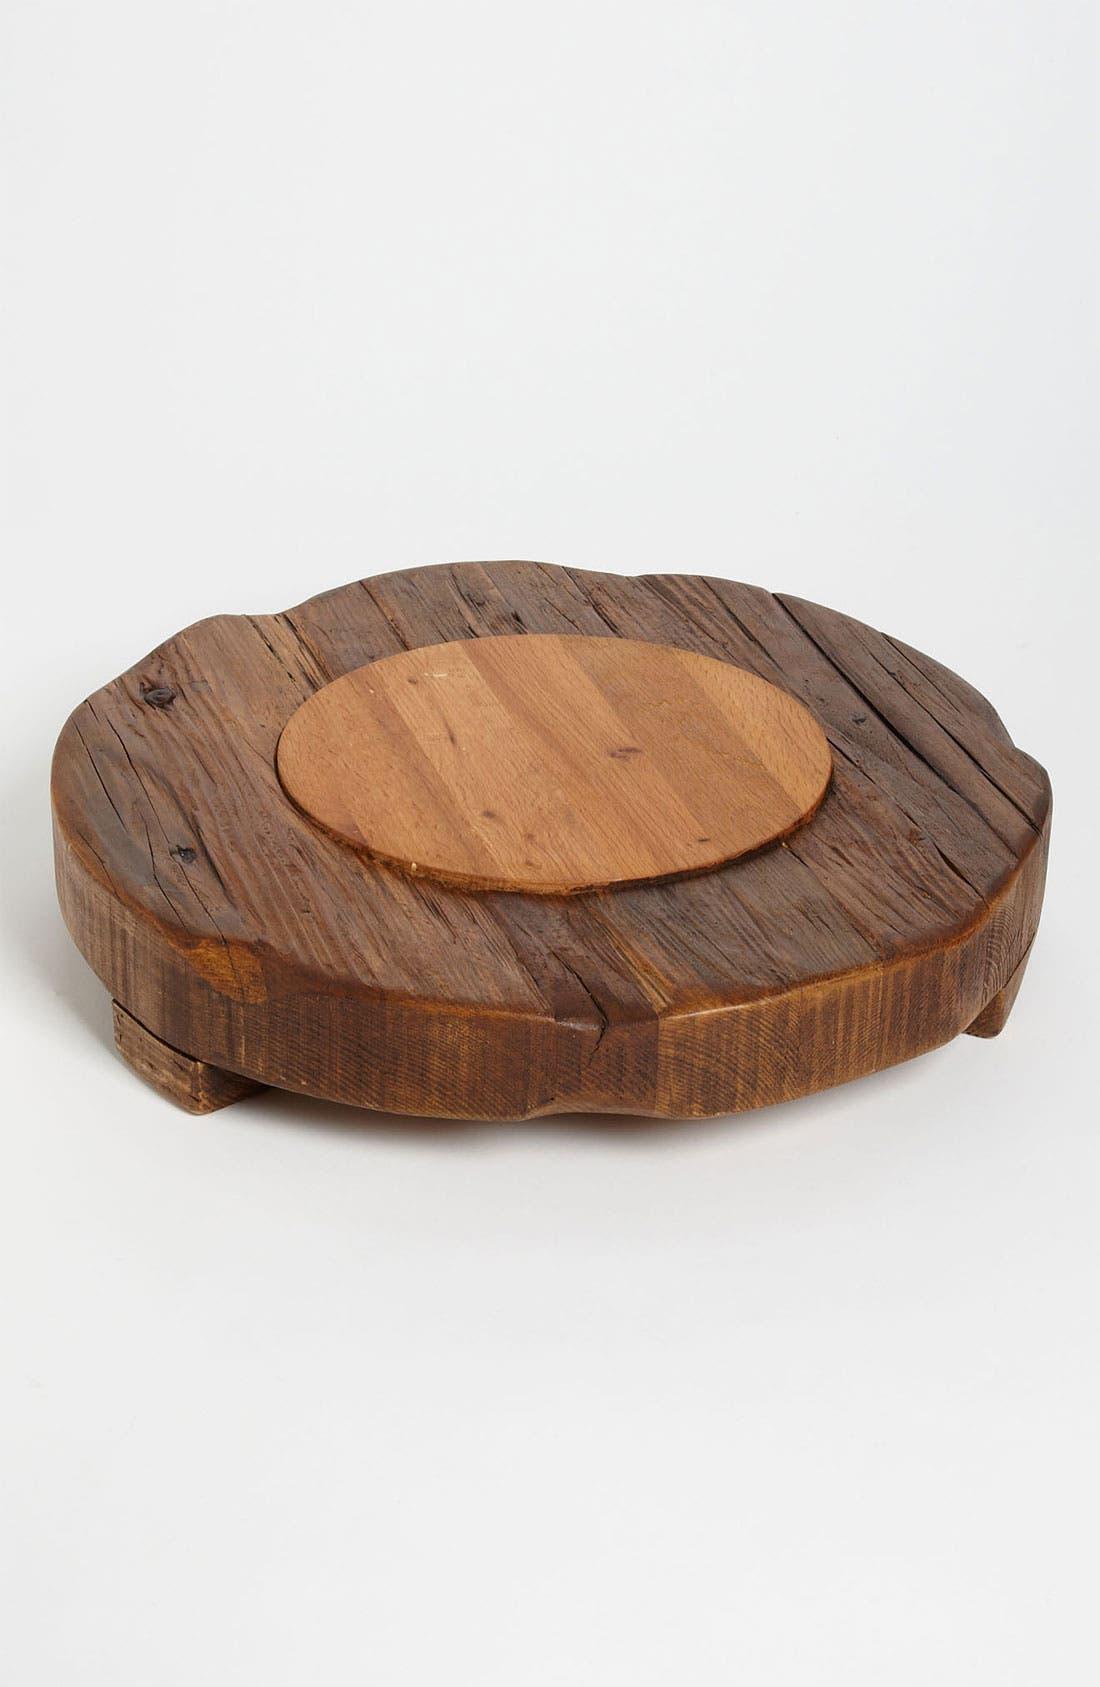 Alternate Image 1 Selected - Europe2You Round Hardwood Inset Trivet